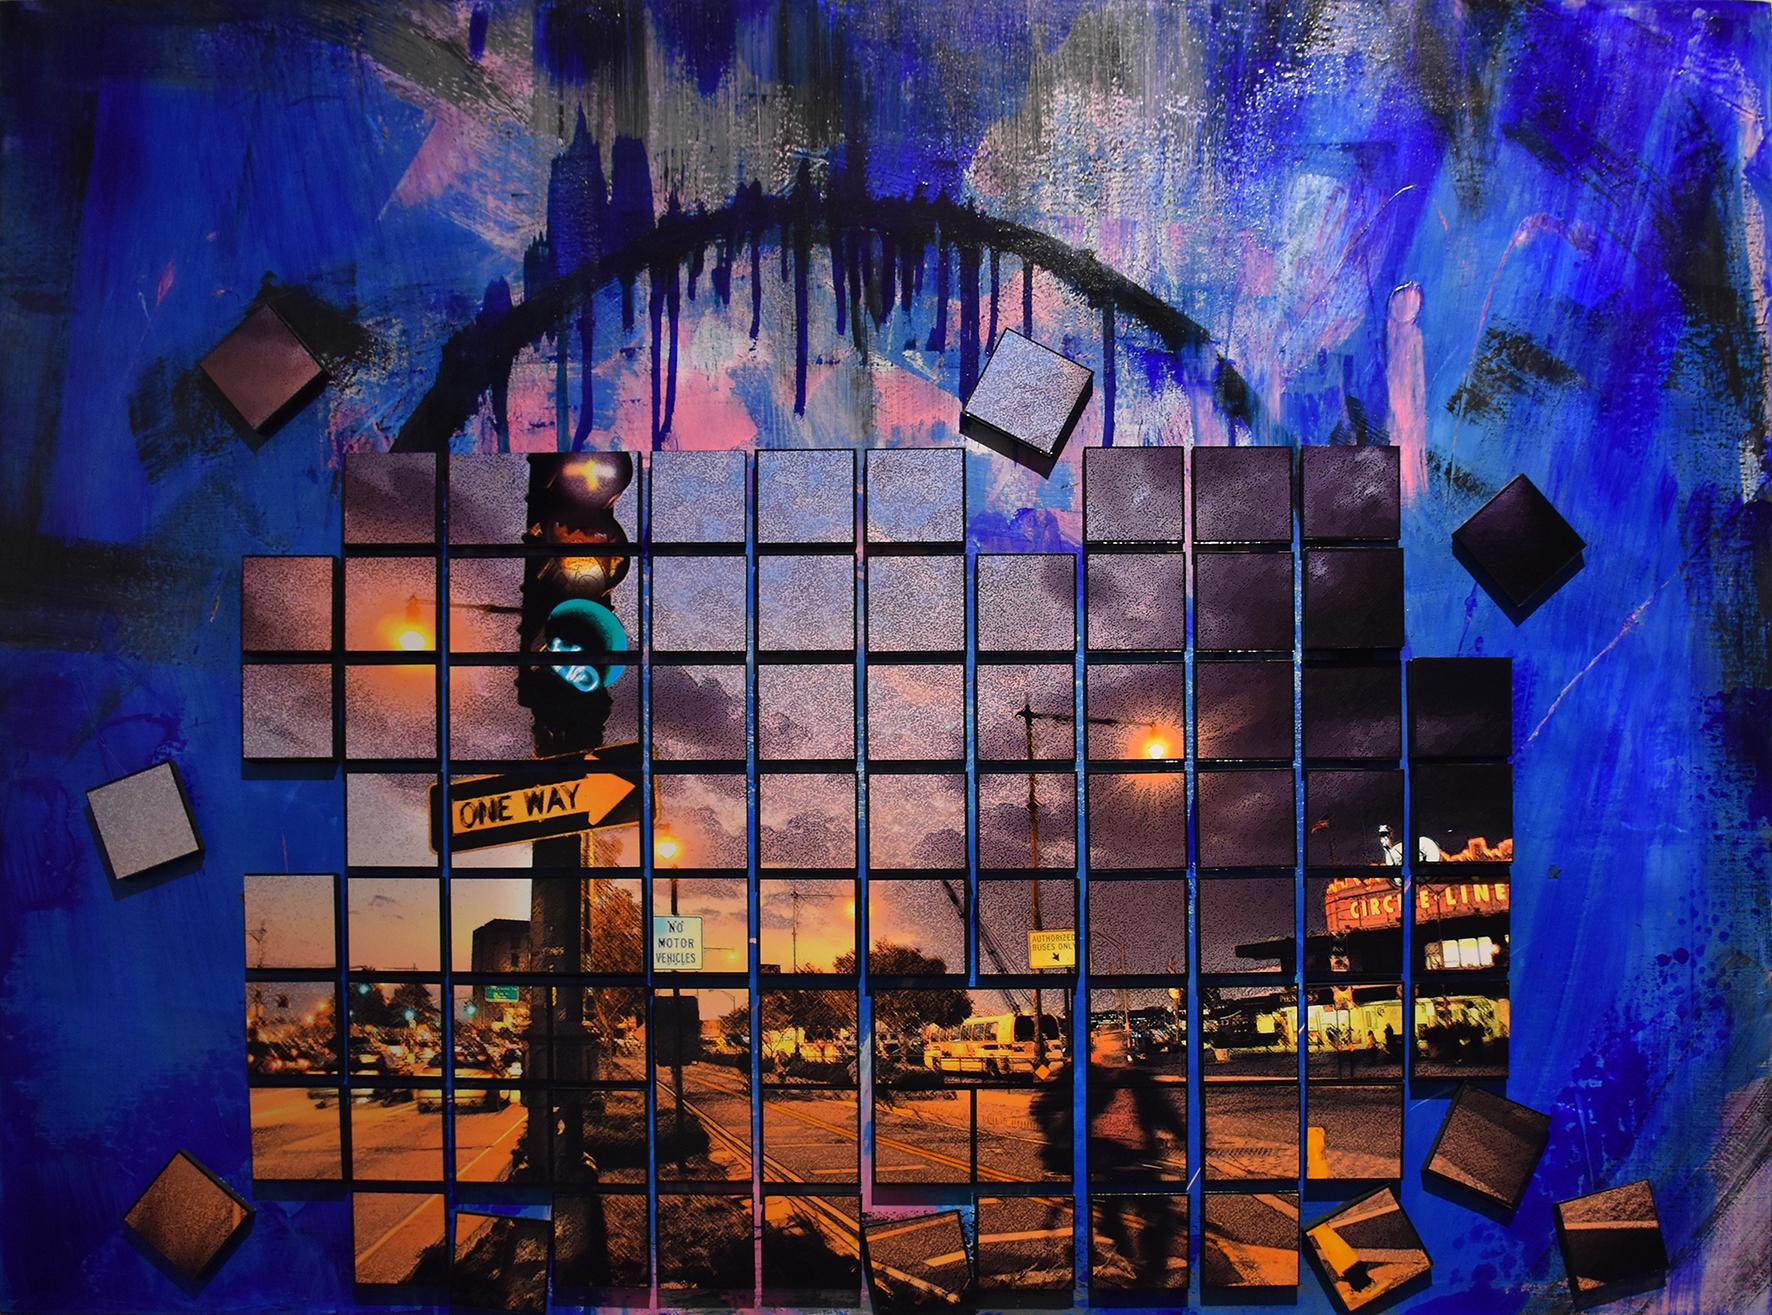 Circle Line - Mixed media on canvas130 x 100 cm